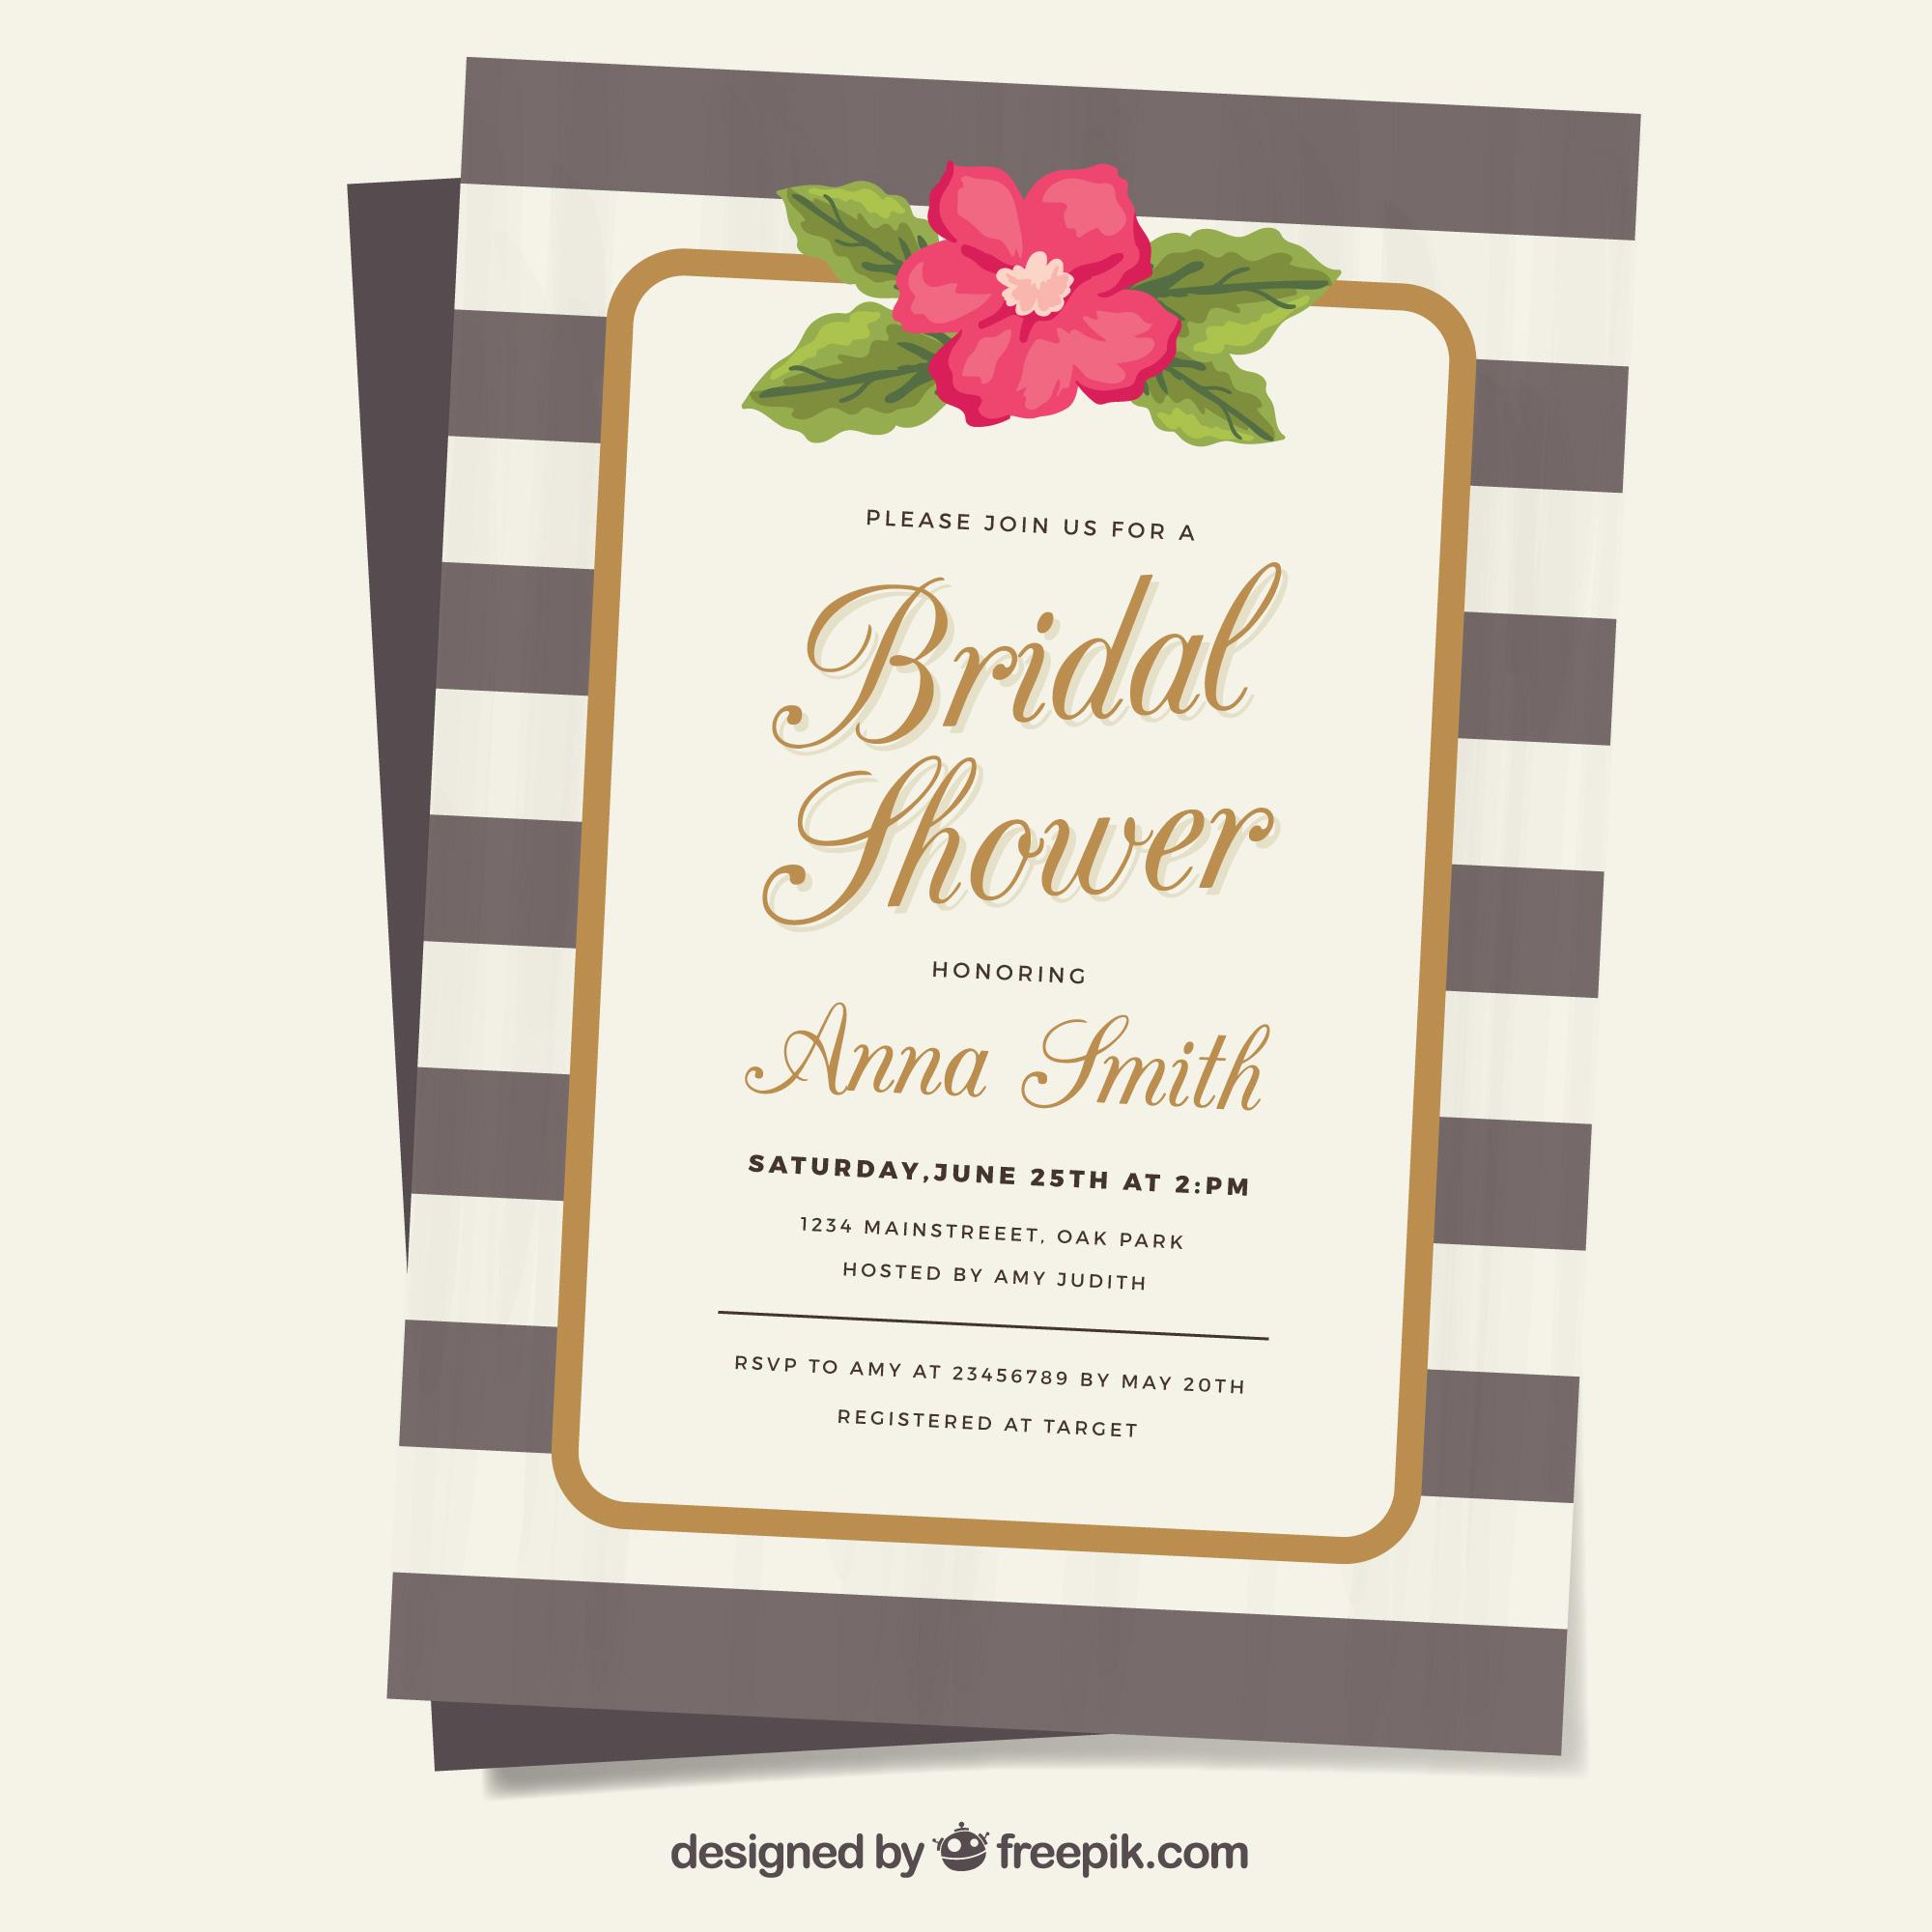 7+ Best Bridal Shower Invitation Designs